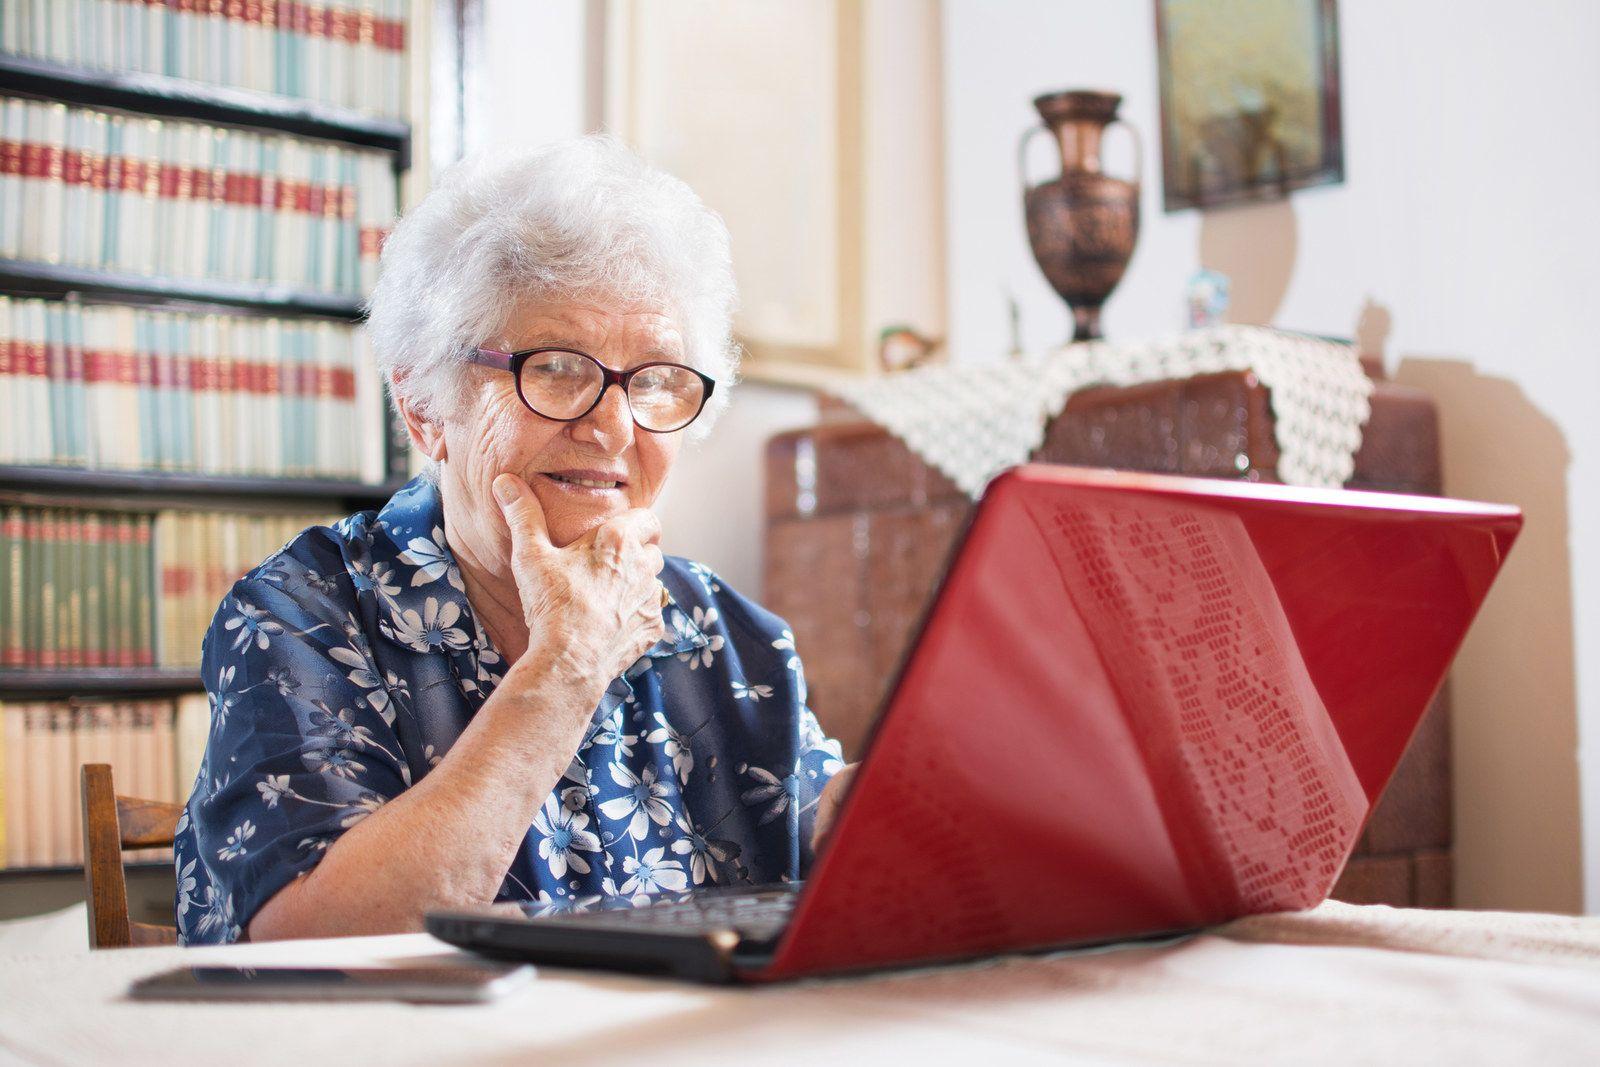 Картинка бабушка с компьютером